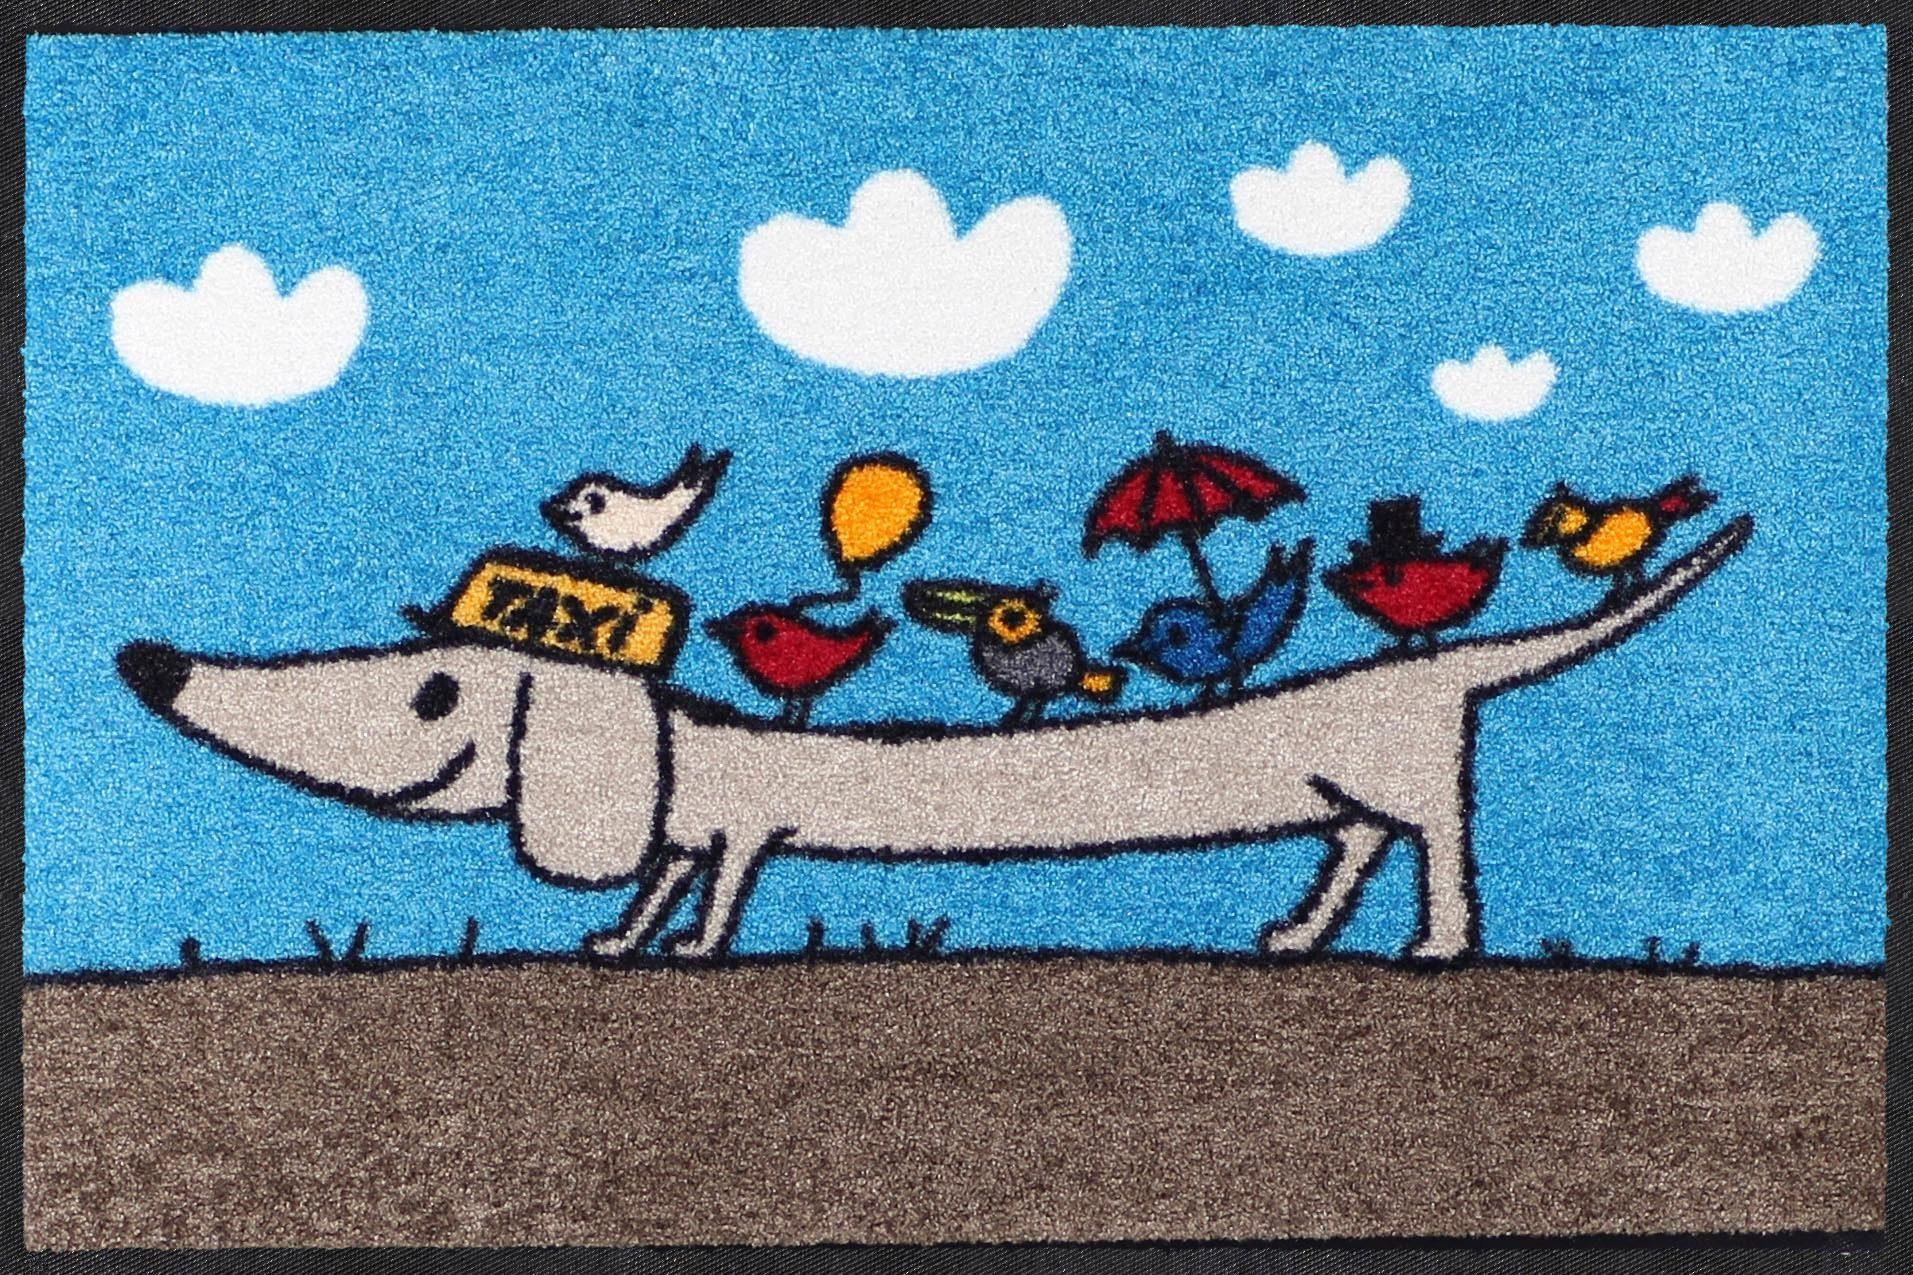 Fußmatte »Joe le taxi«, Salonloewe, rechteckig, Höhe 7 mm